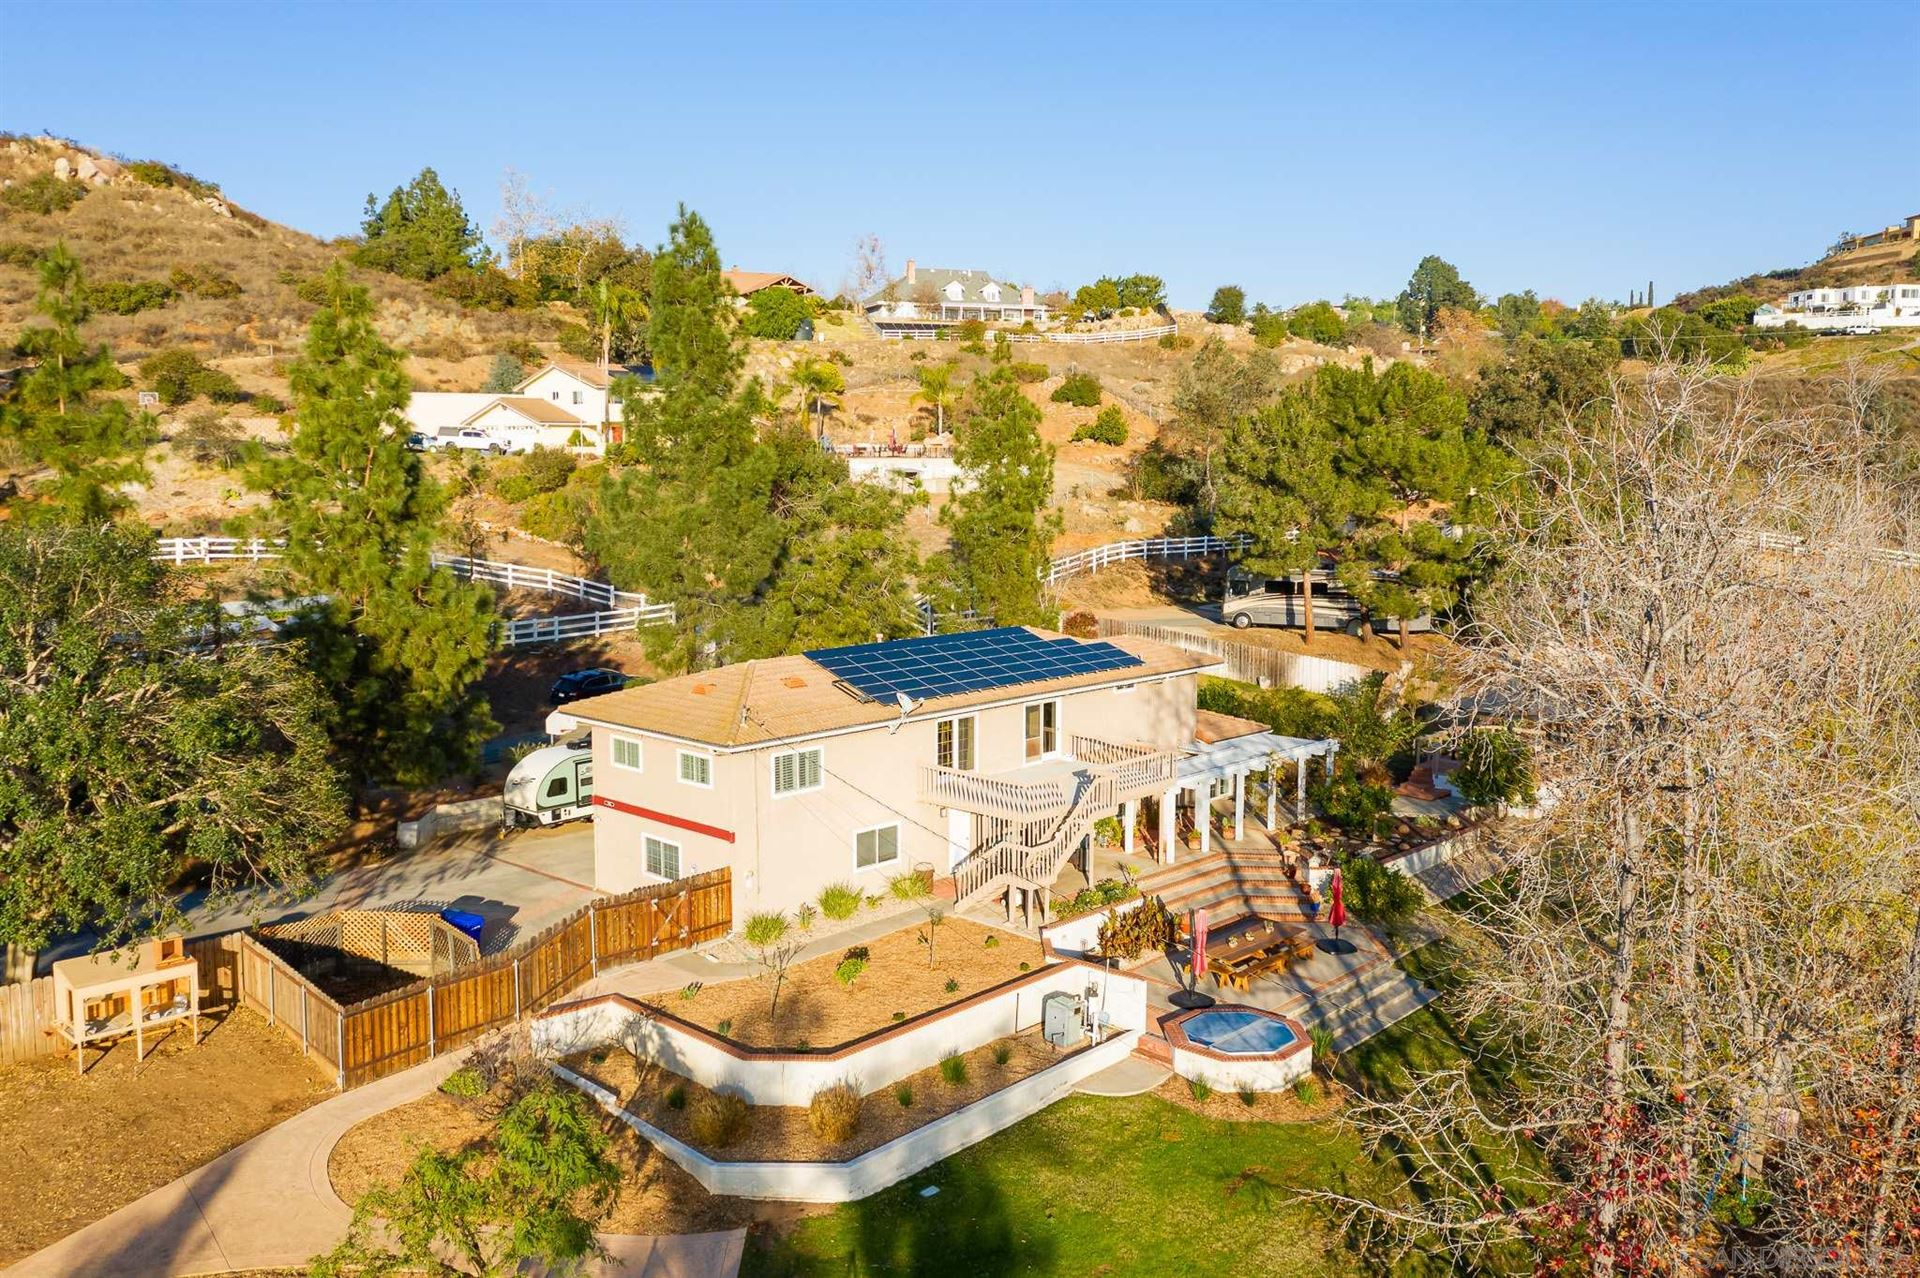 Photo of 13865 Adrian St, Poway, CA 92064 (MLS # 210000719)